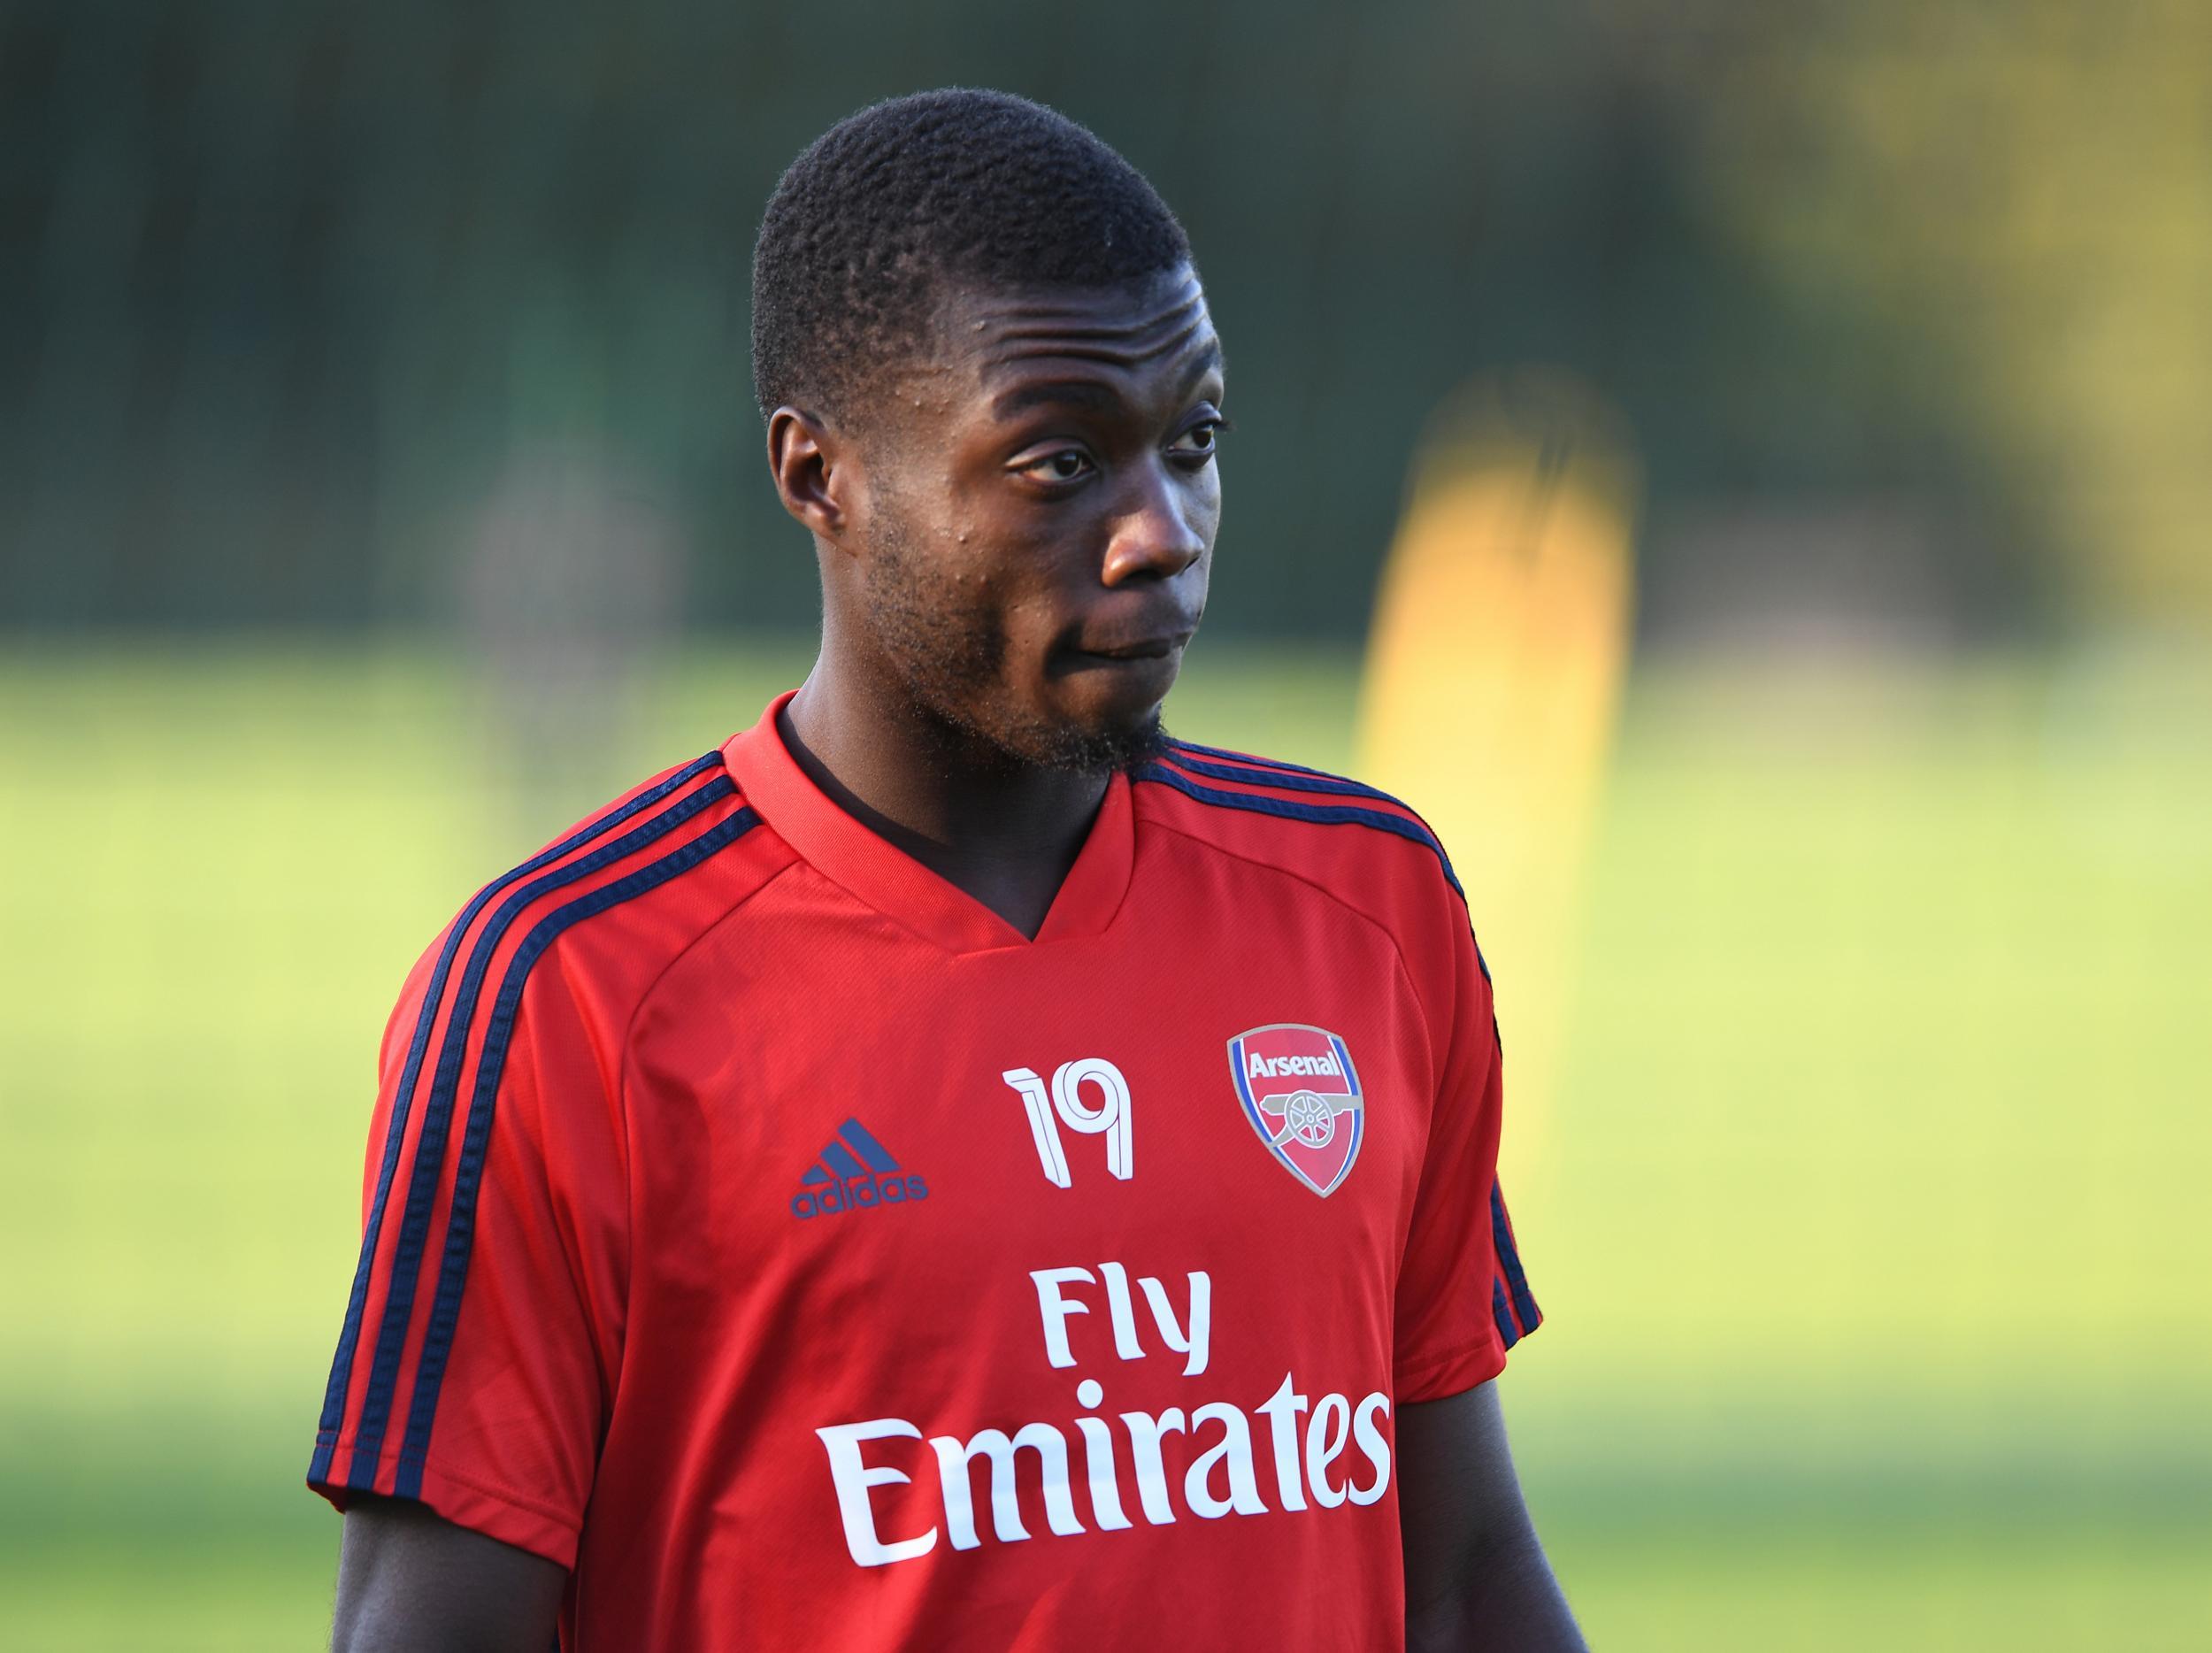 Arsenal boss Unai Emery admits summer transfer Nicolas Pepe still has plenty to do to impress him